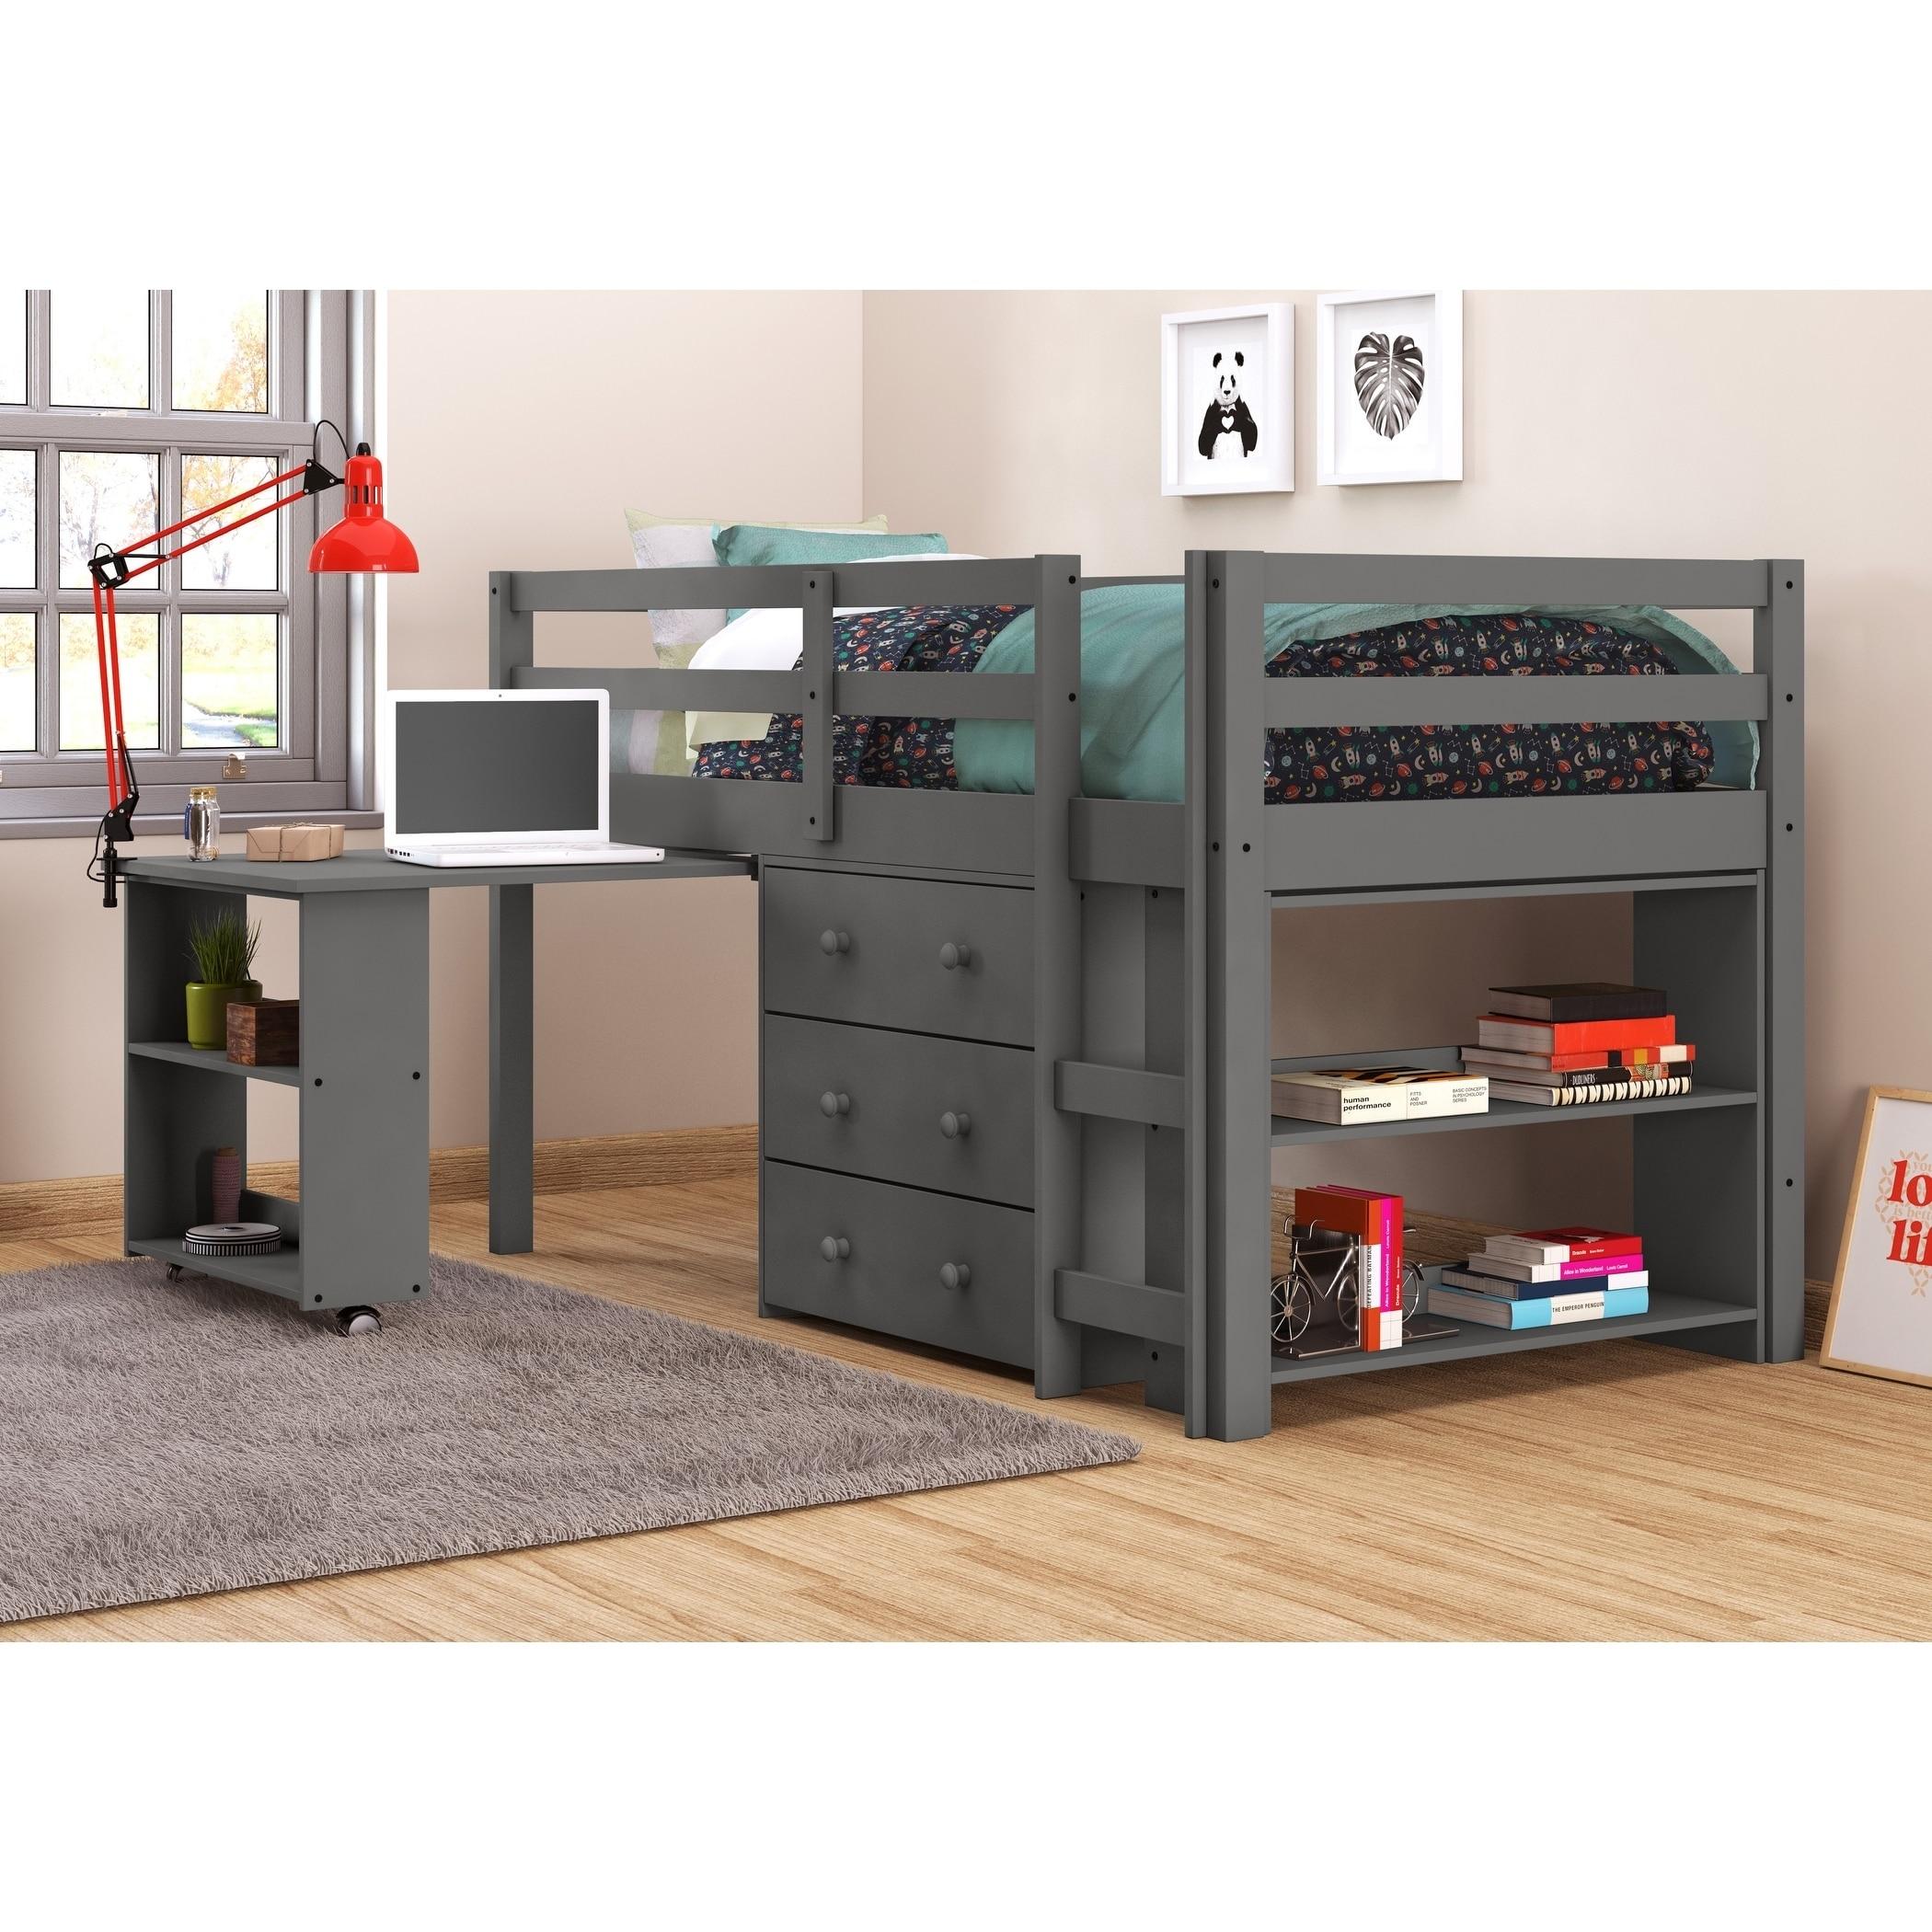 Donco Kids Low Study Loft Desk Twin Bed